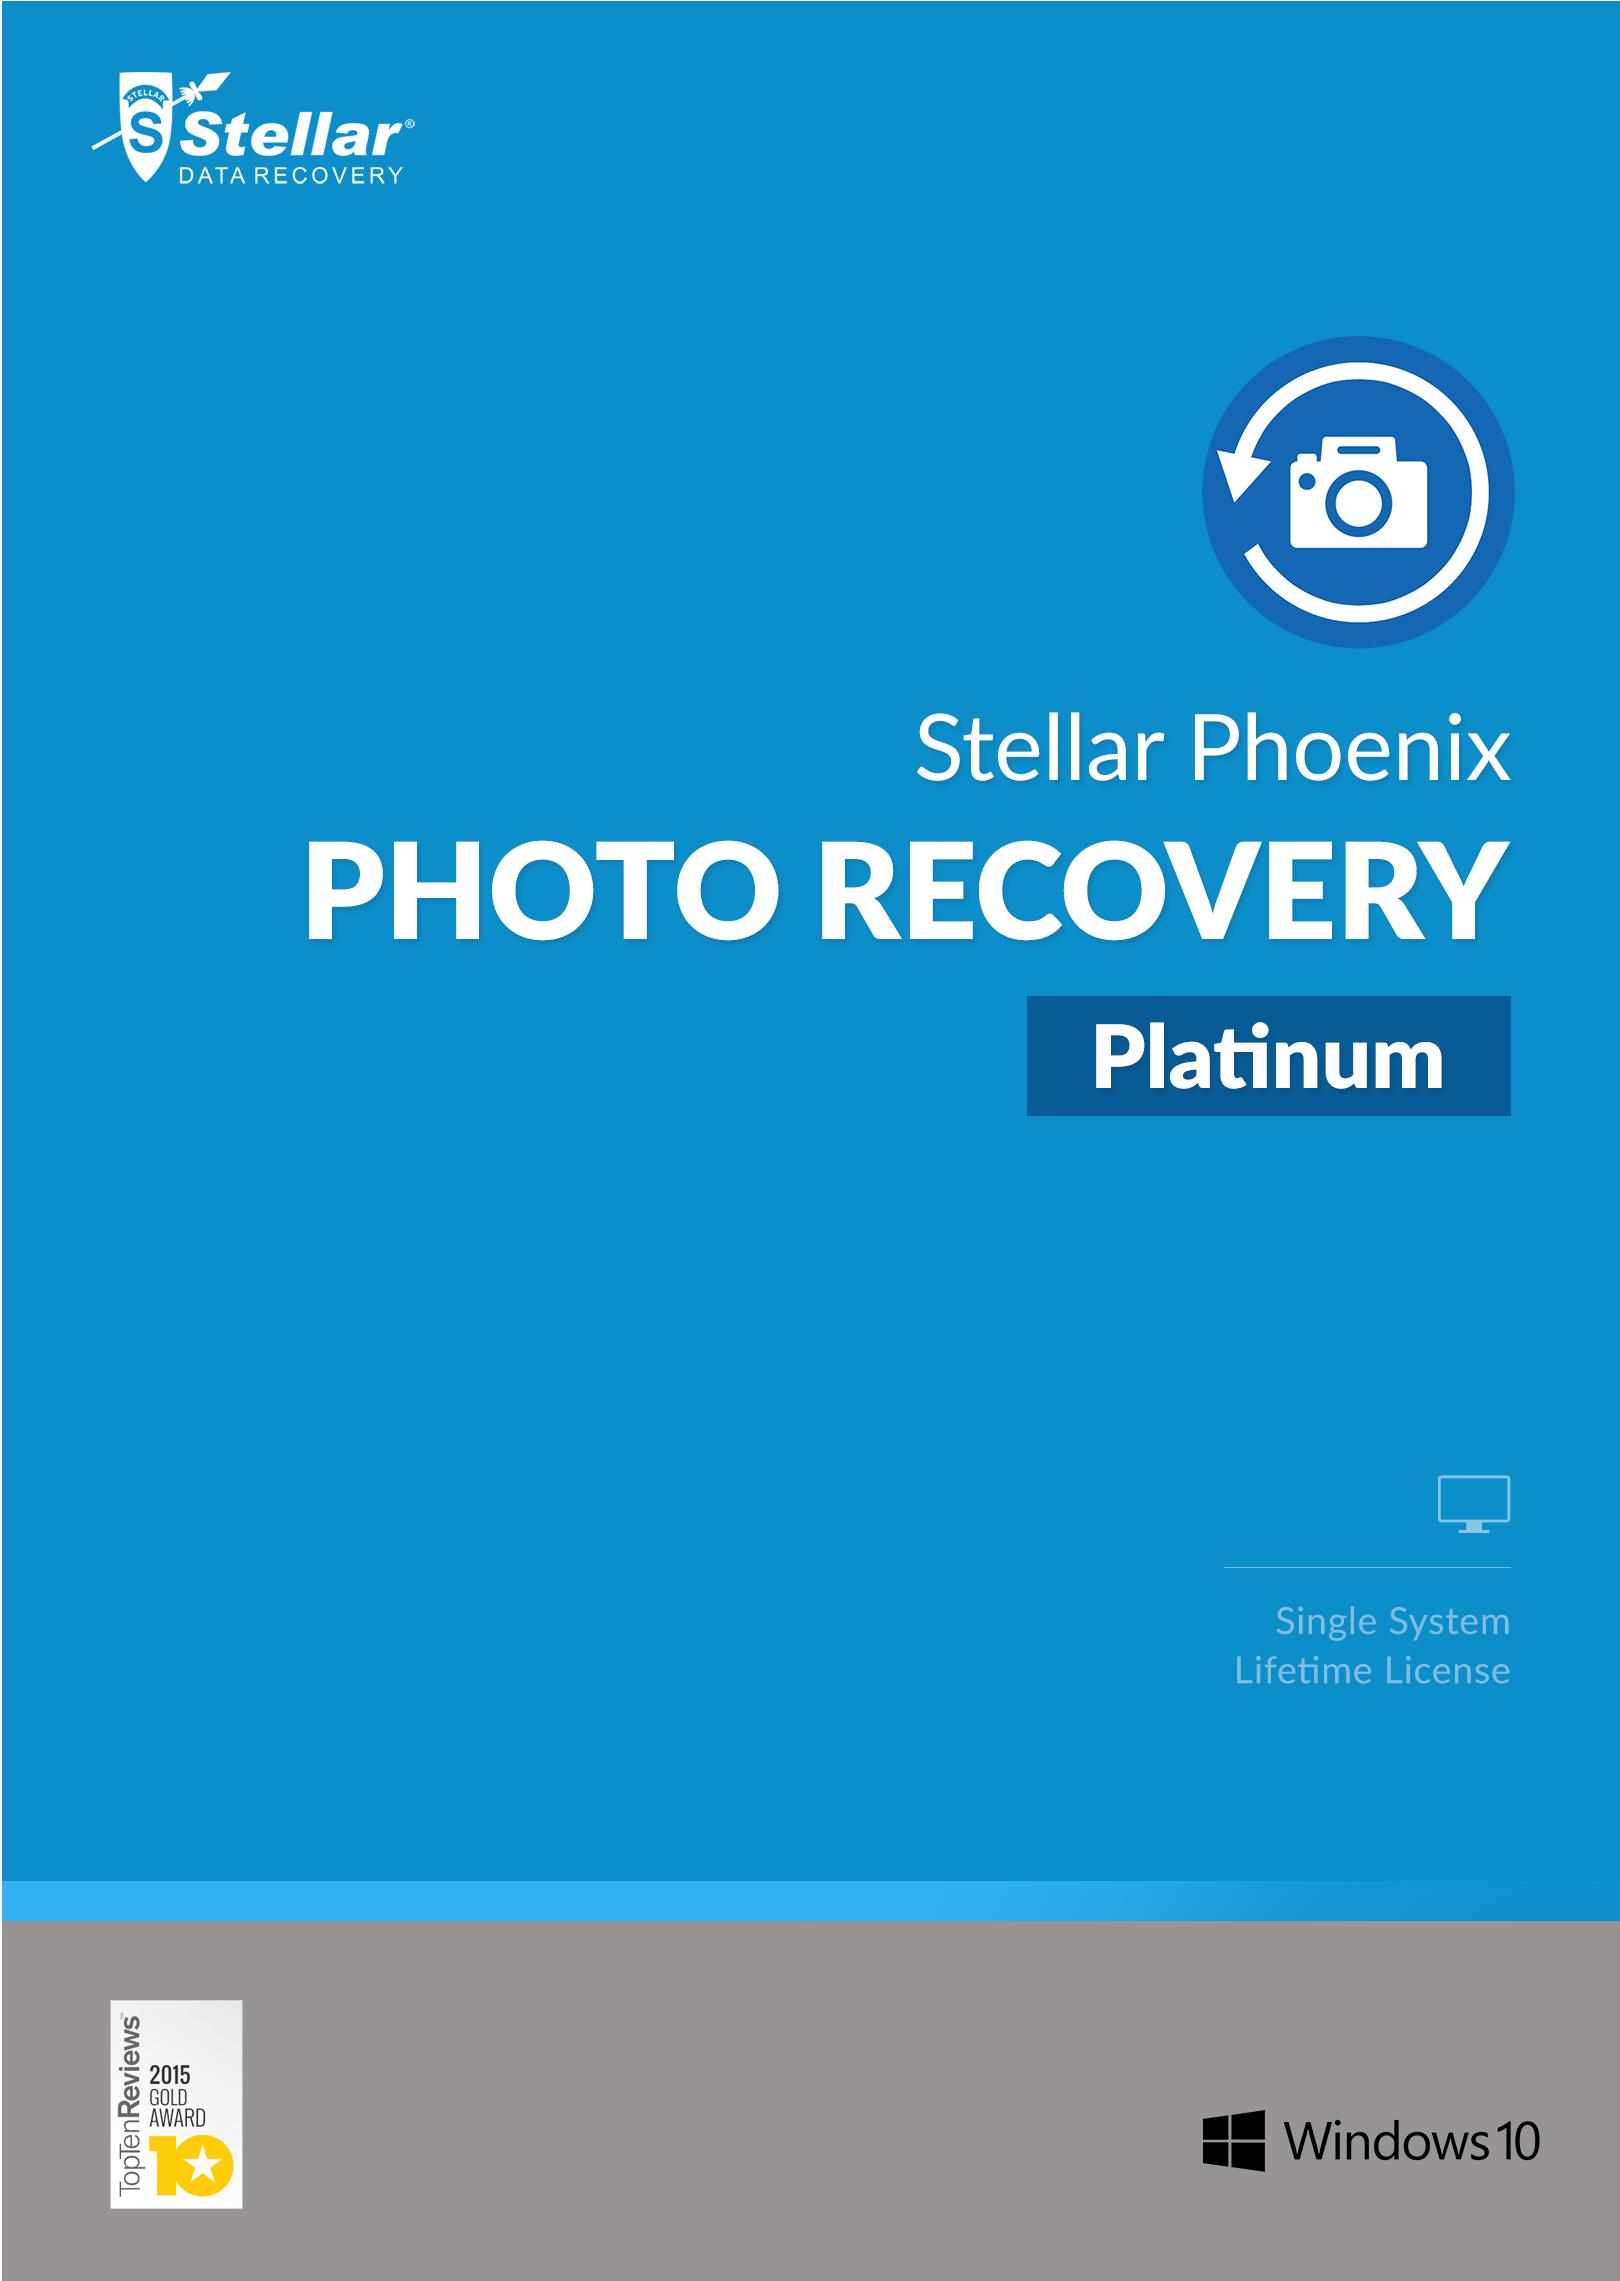 stellar phoenix photo recovery platinum windows download amazon